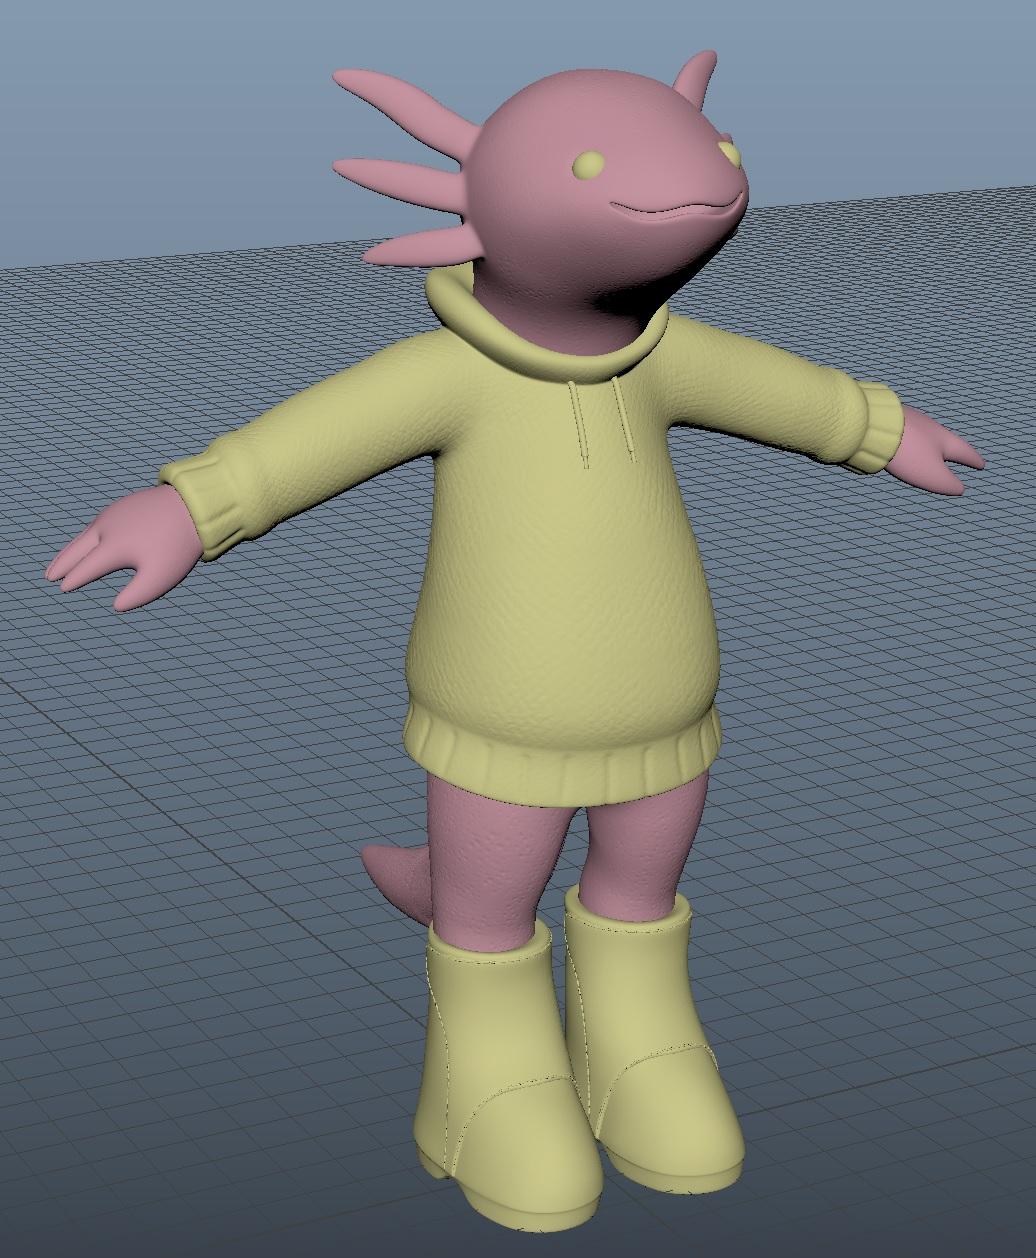 wip axolotl4.jpg